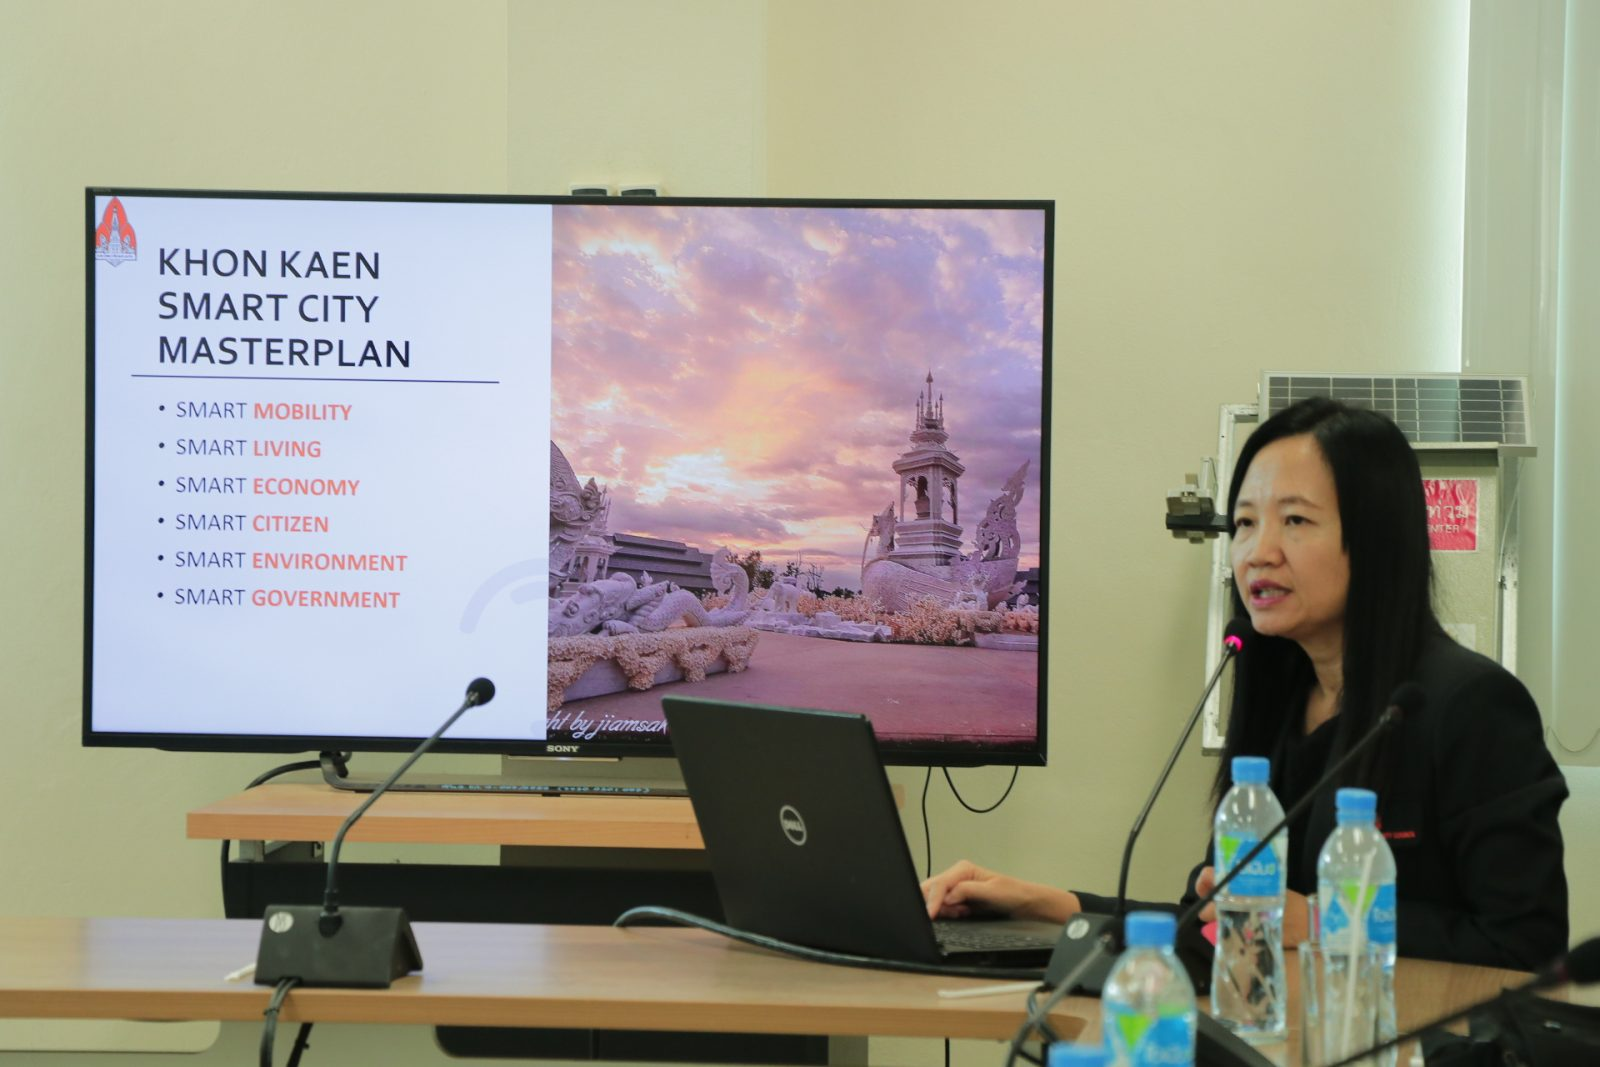 KKU Library fuels research on Smart City development for keys offices in Khon Kaen